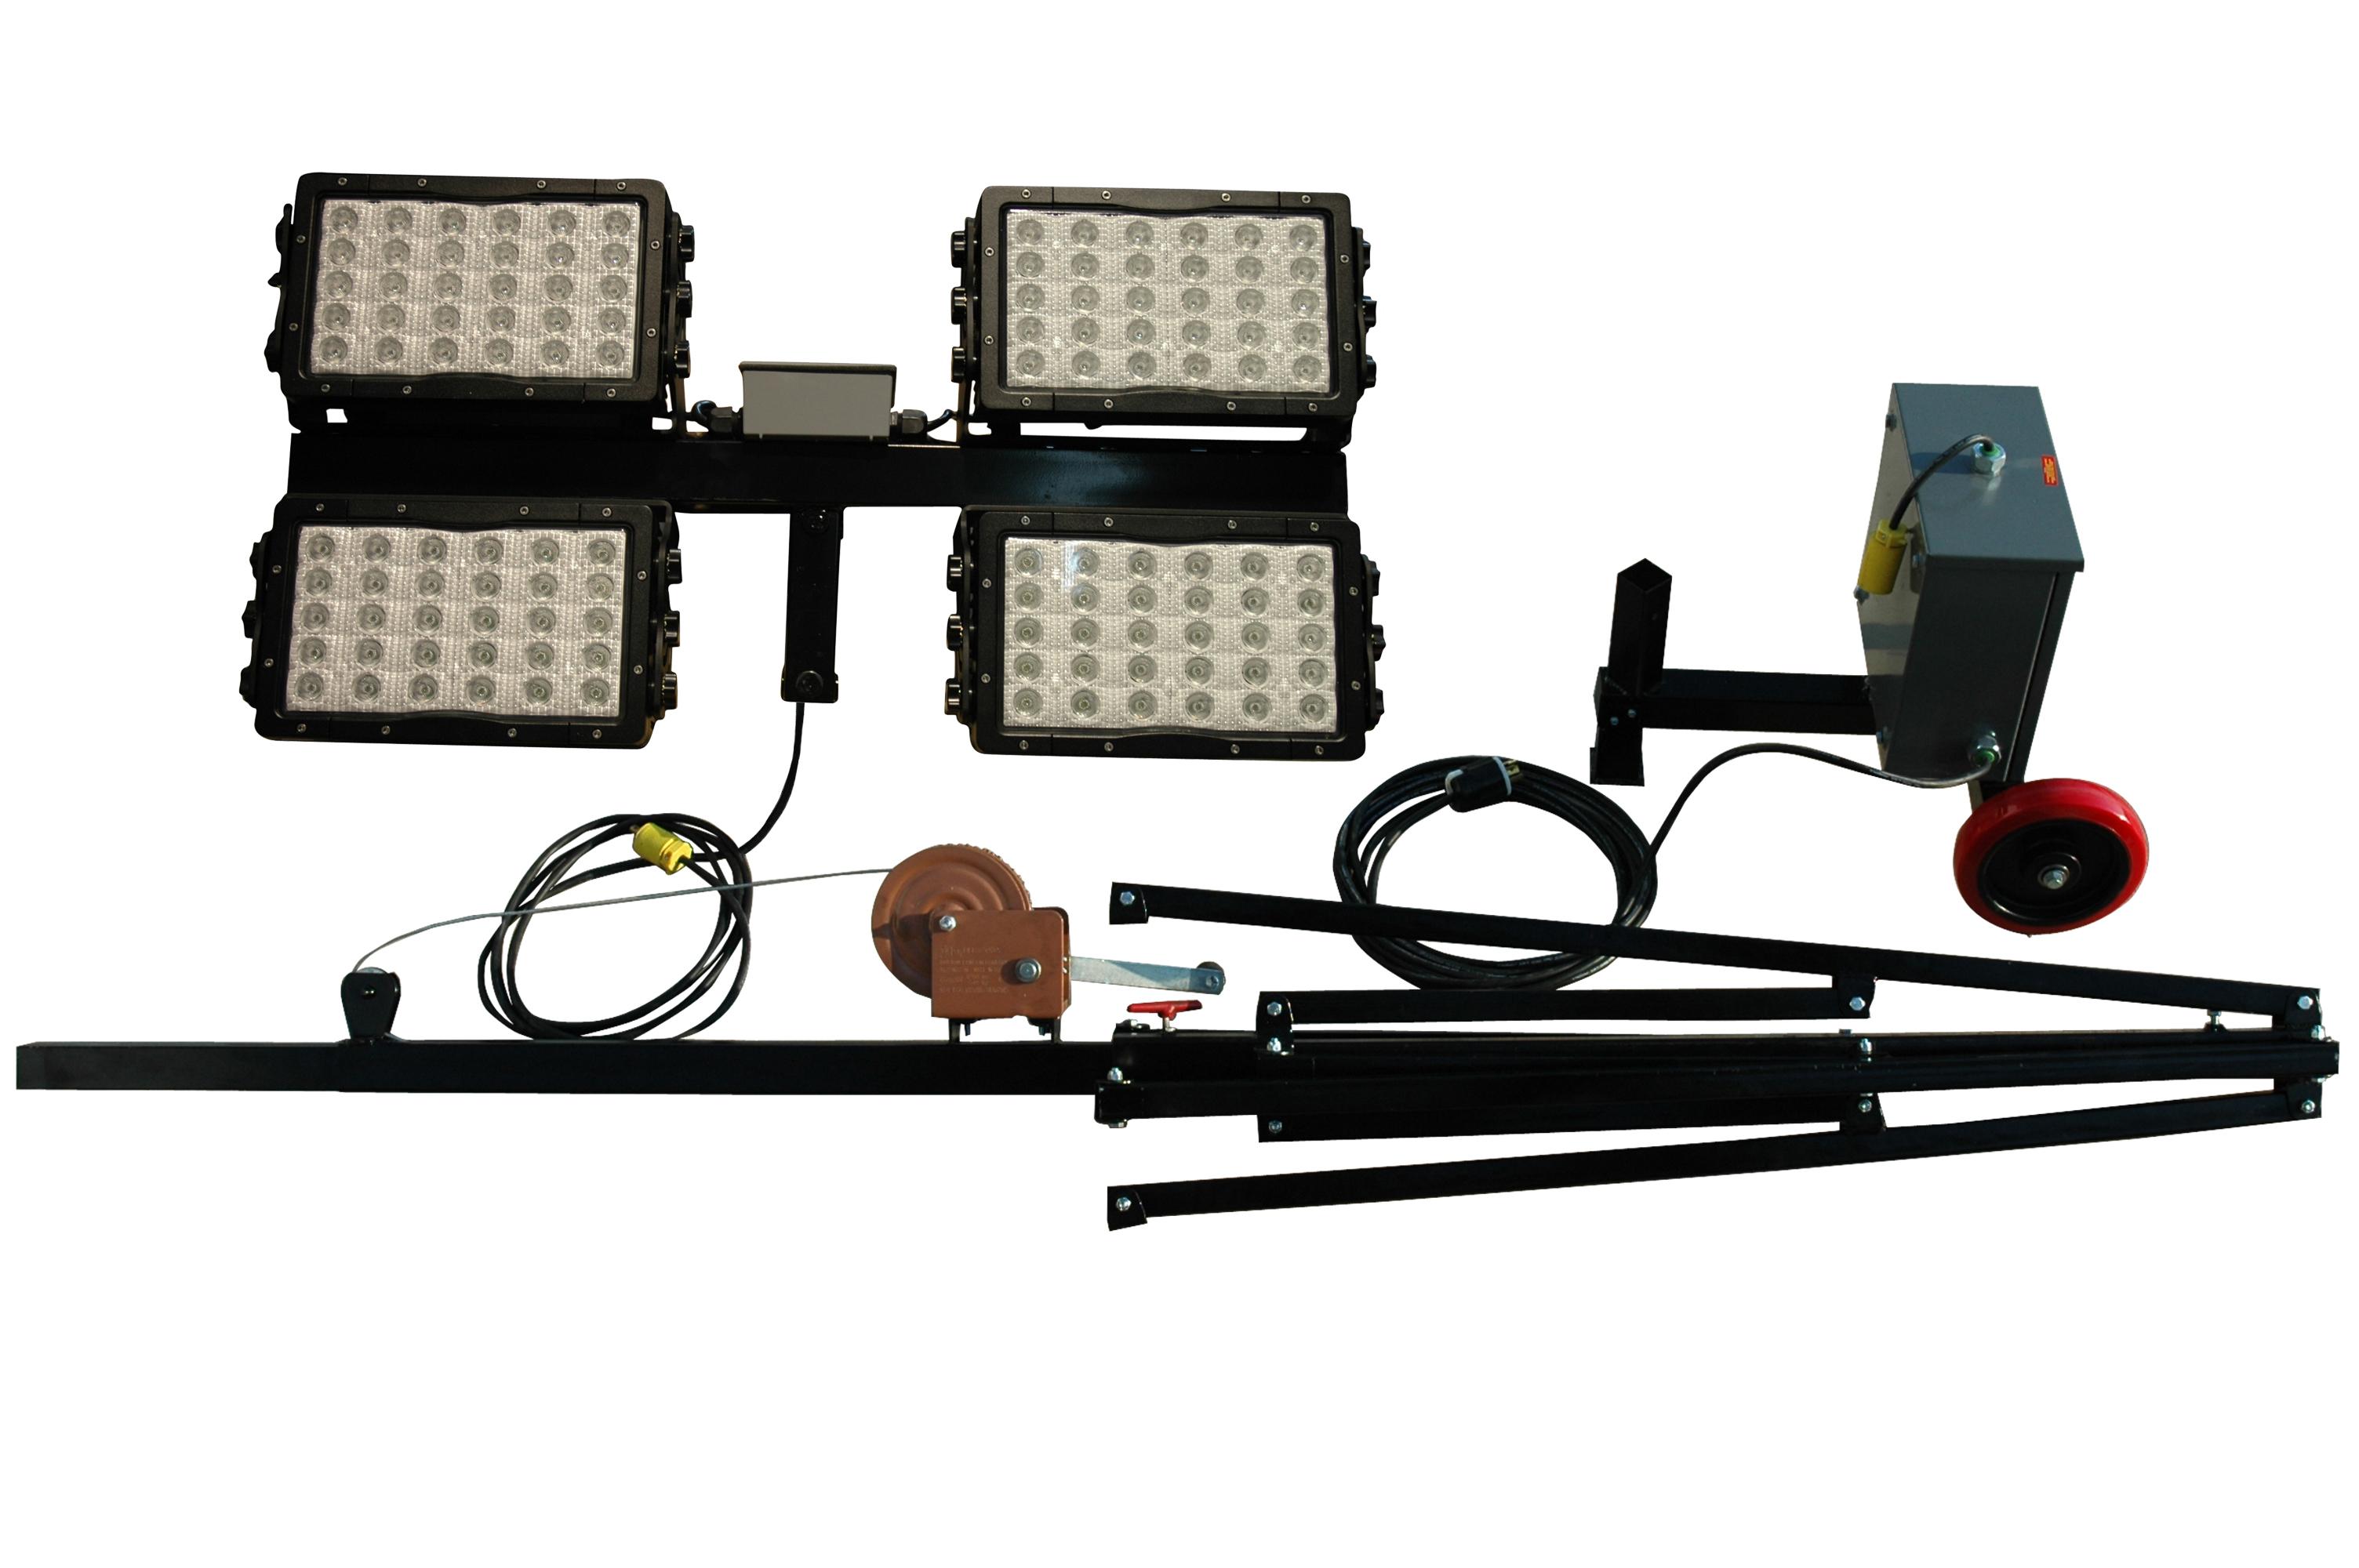 Work Site Lighting Waterproof Portable 600 Watt LED Light Tower600 Watt LED  Waterproof Lights On Light Weight Aluminum Quadpod